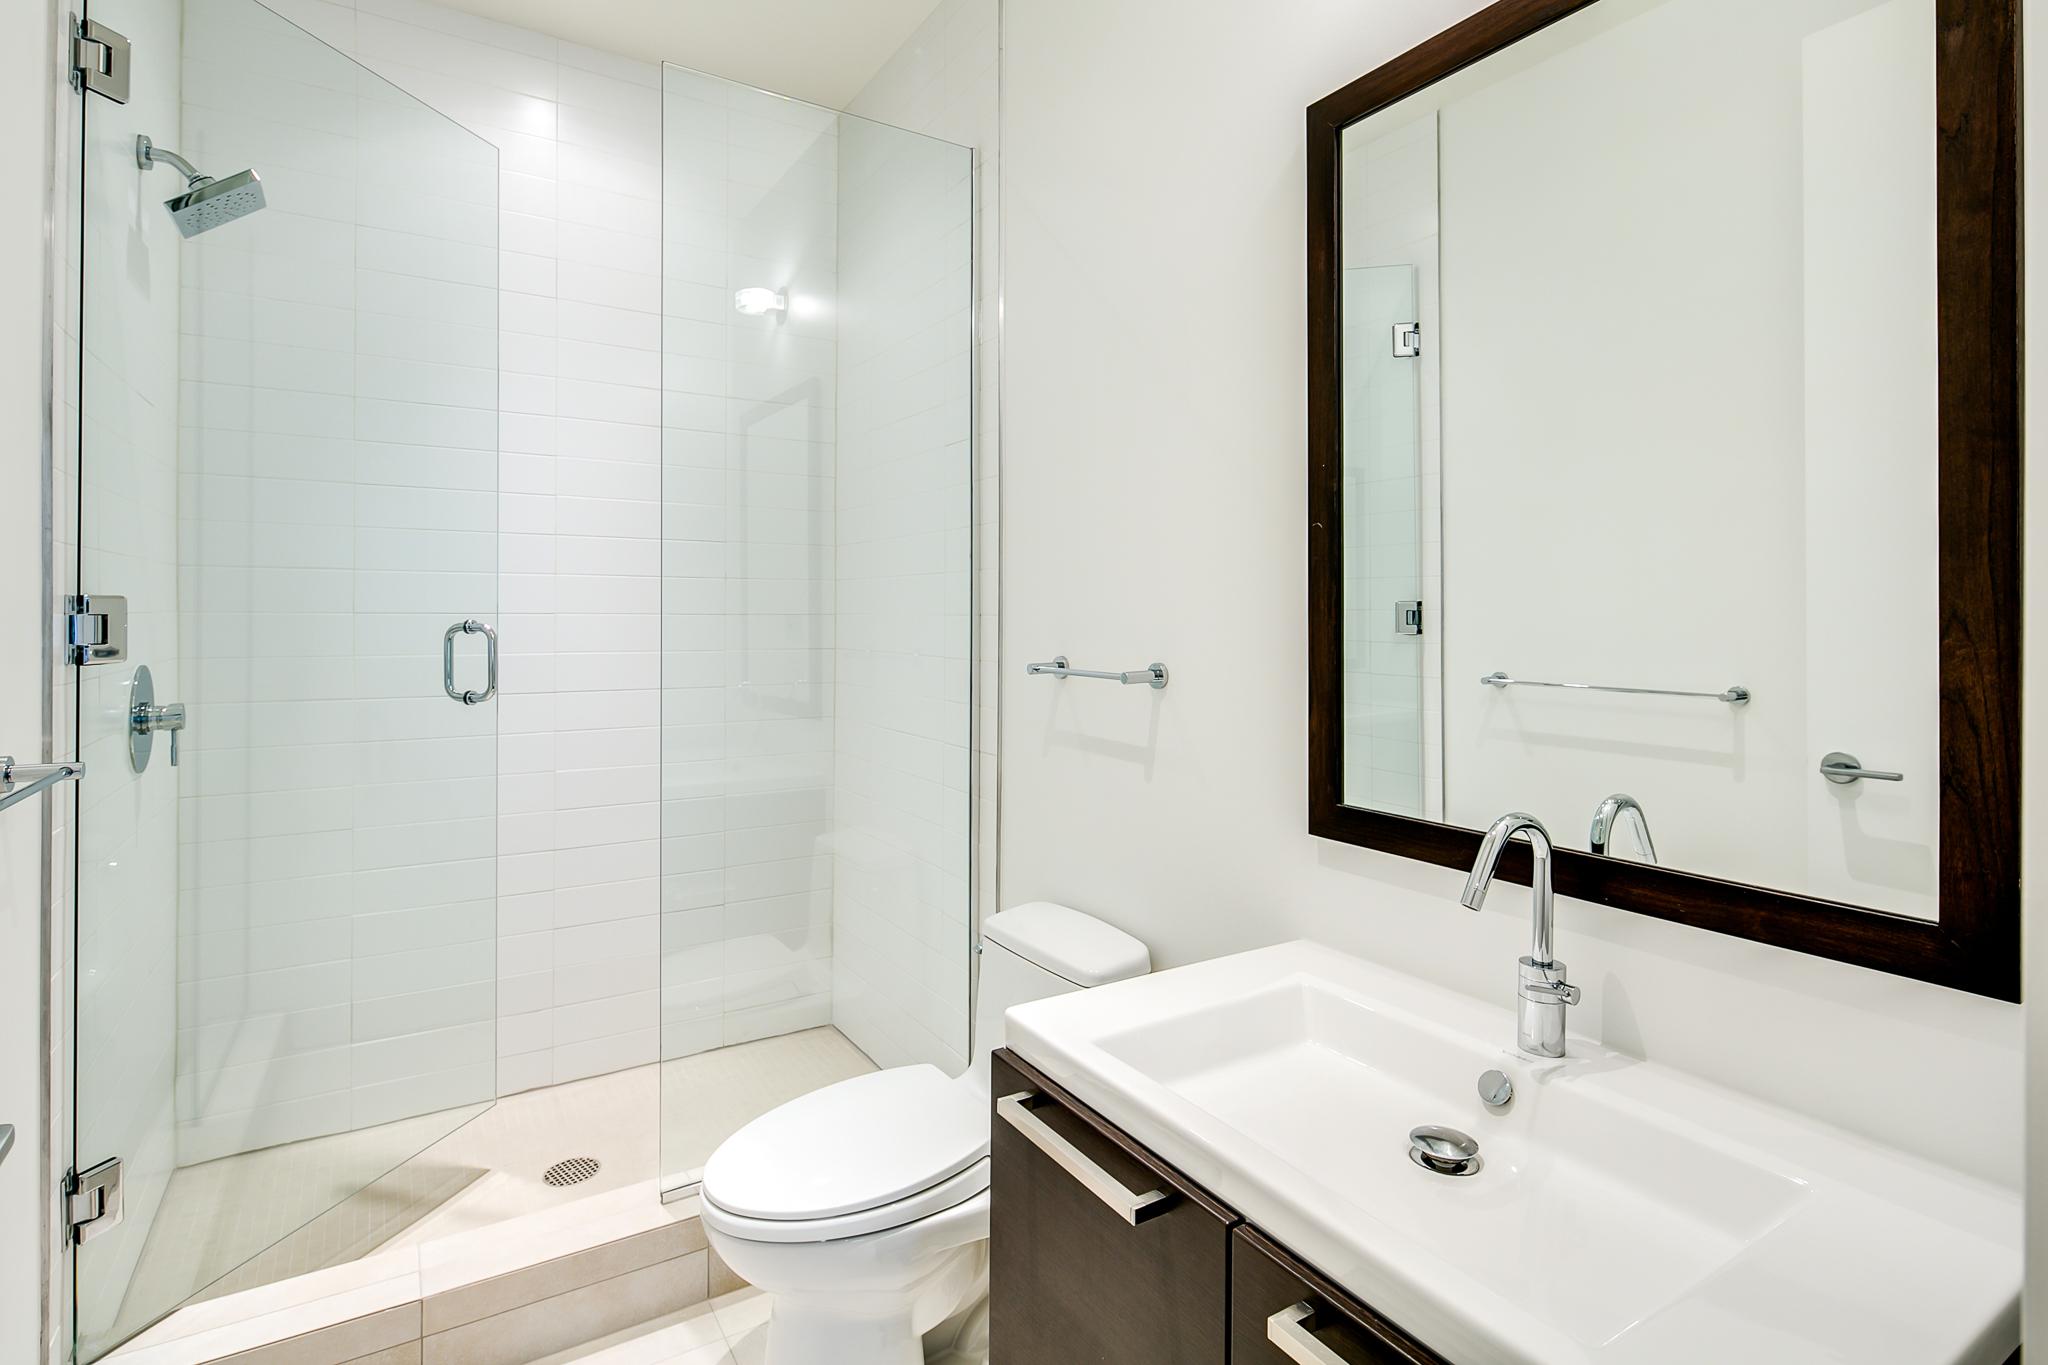 13_Upper Level-Bathroom-2 (1) - SUGARCUBE BUILDING | LUXURY LIVING